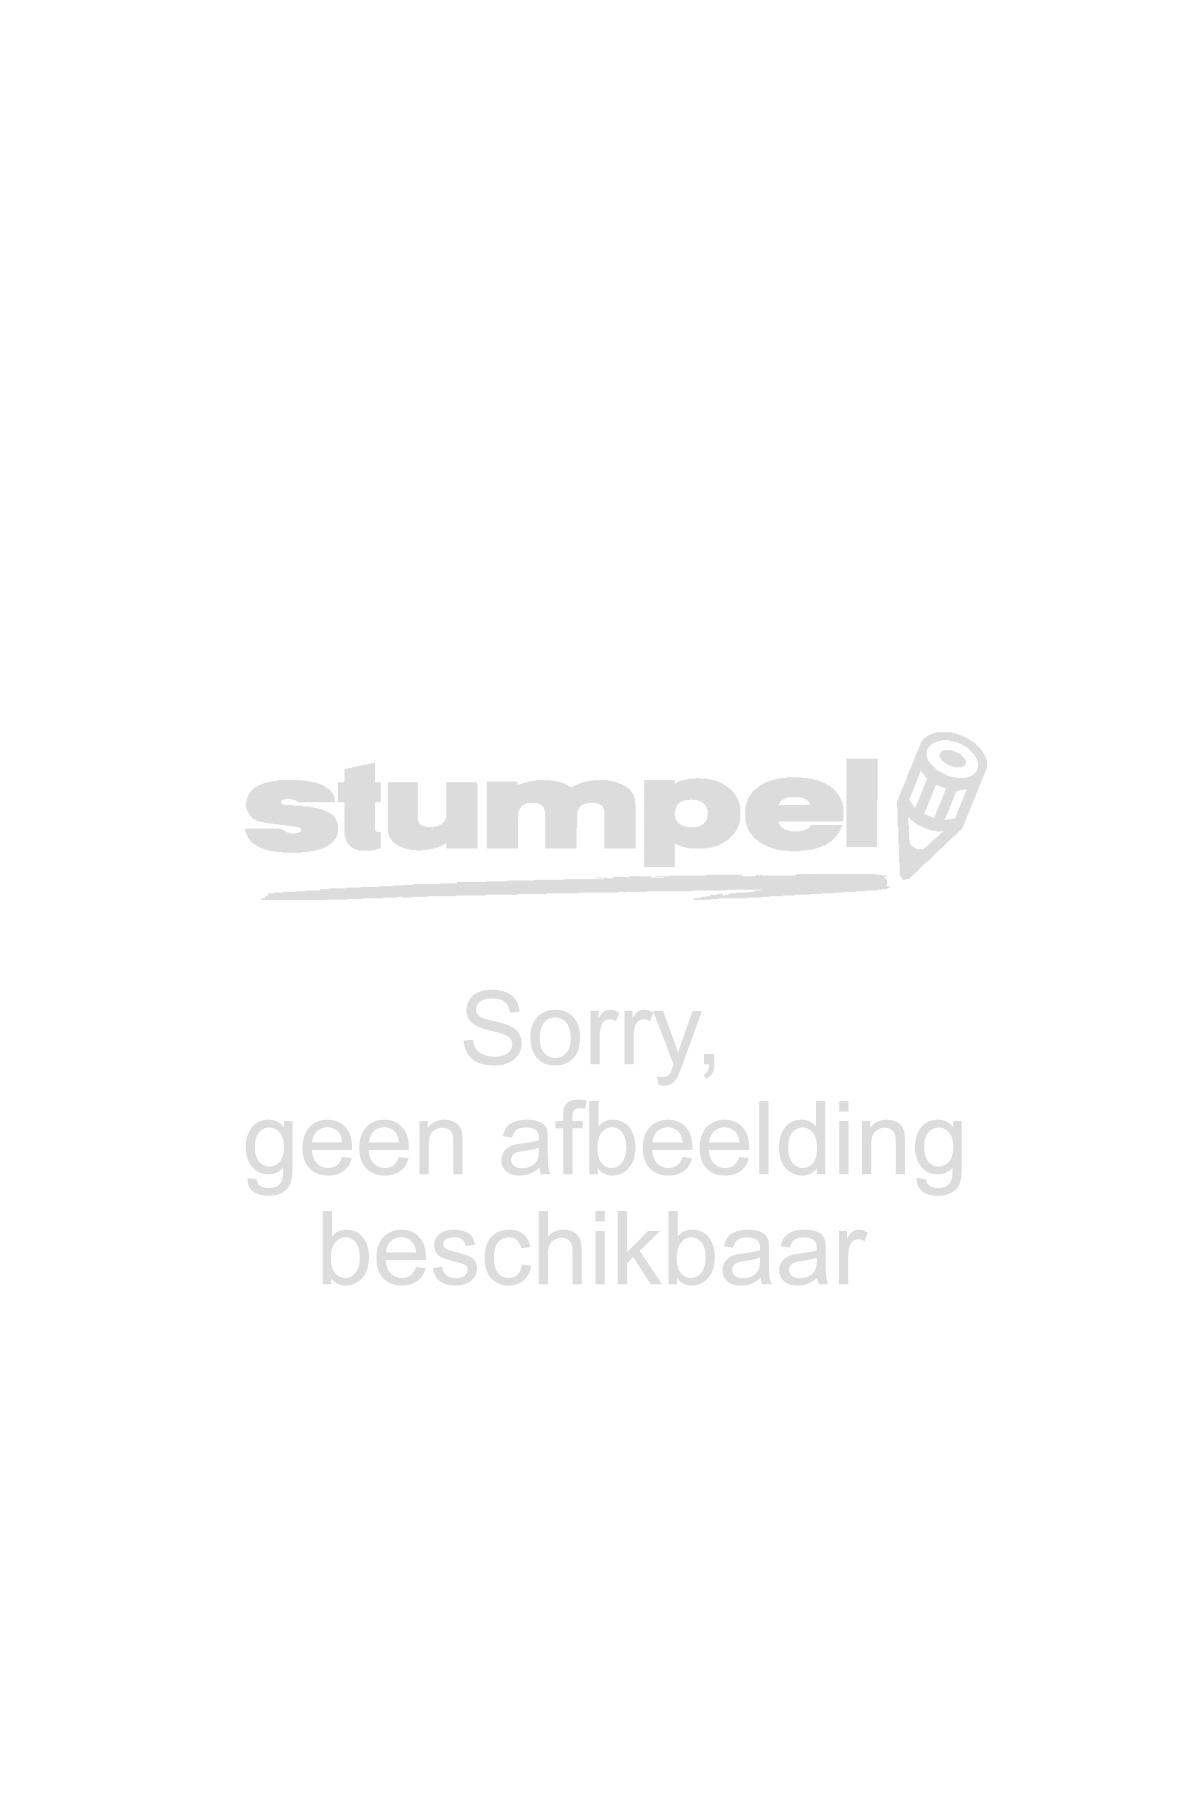 agenda-2021-ryam-efficiency-kort-1-dag-nl-bruin-11010917